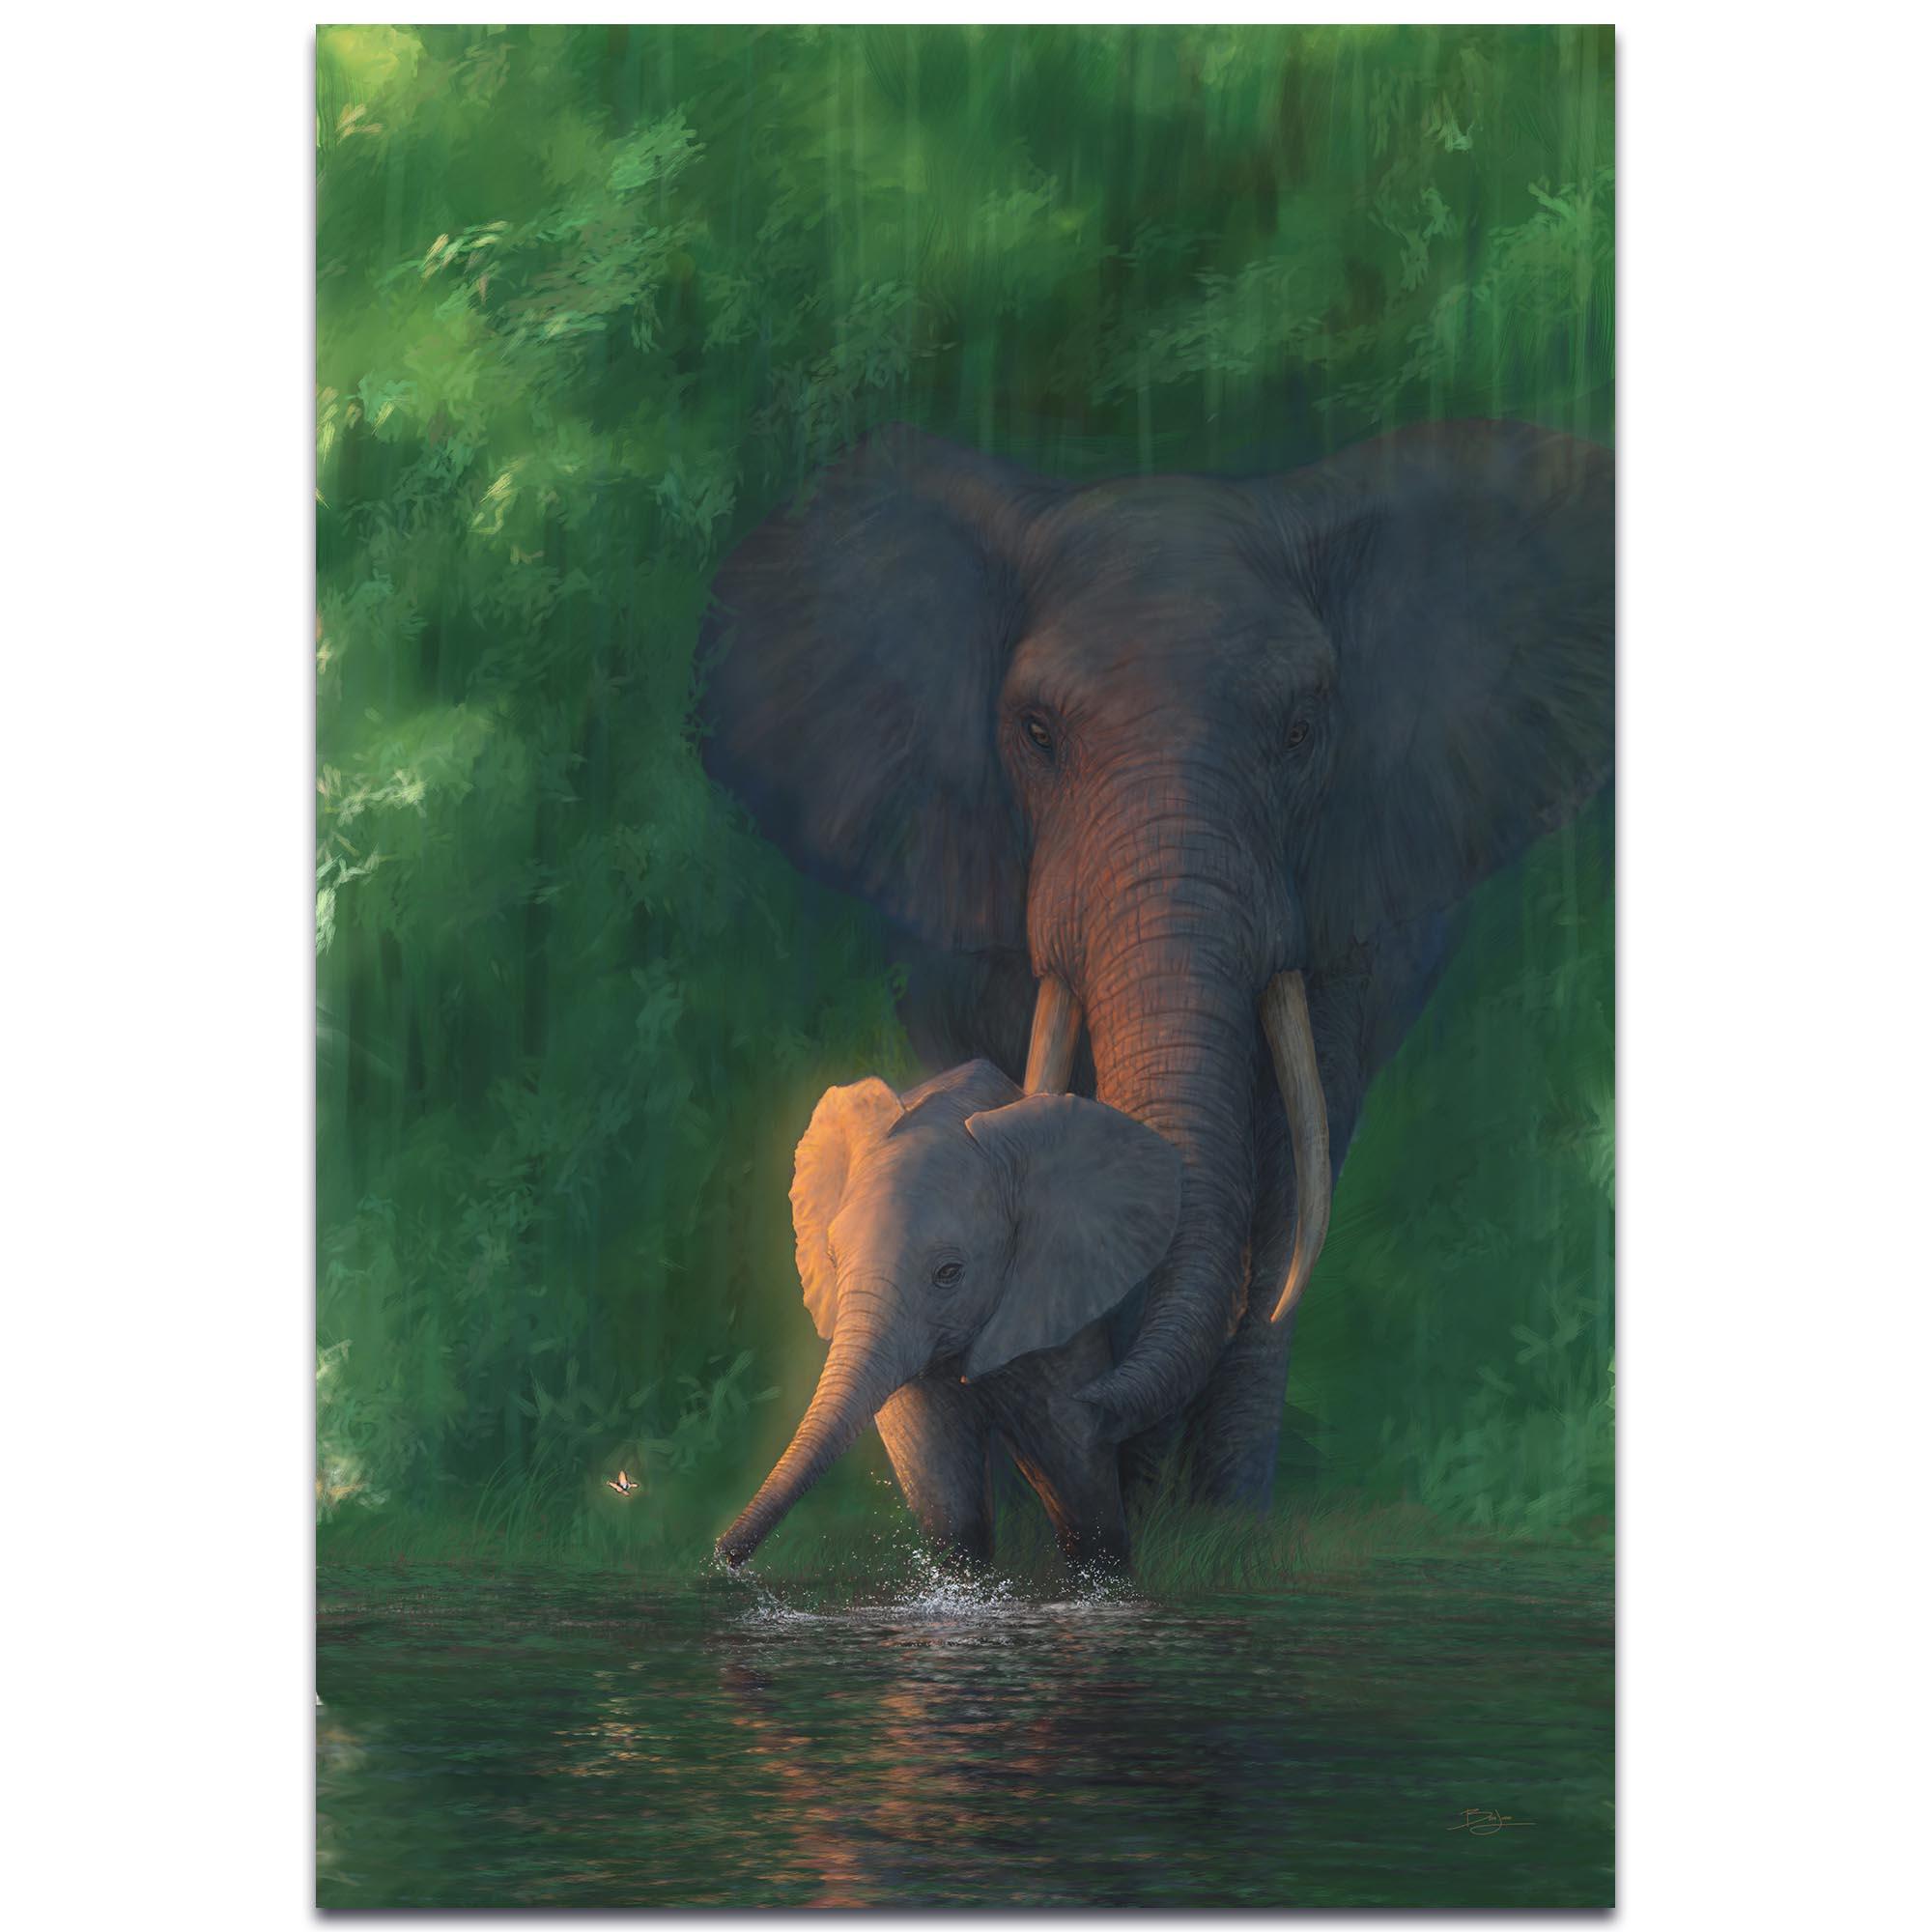 Elephant Wall Art 'Carefree Calf' - African Wildlife Decor on Metal or Acrylic